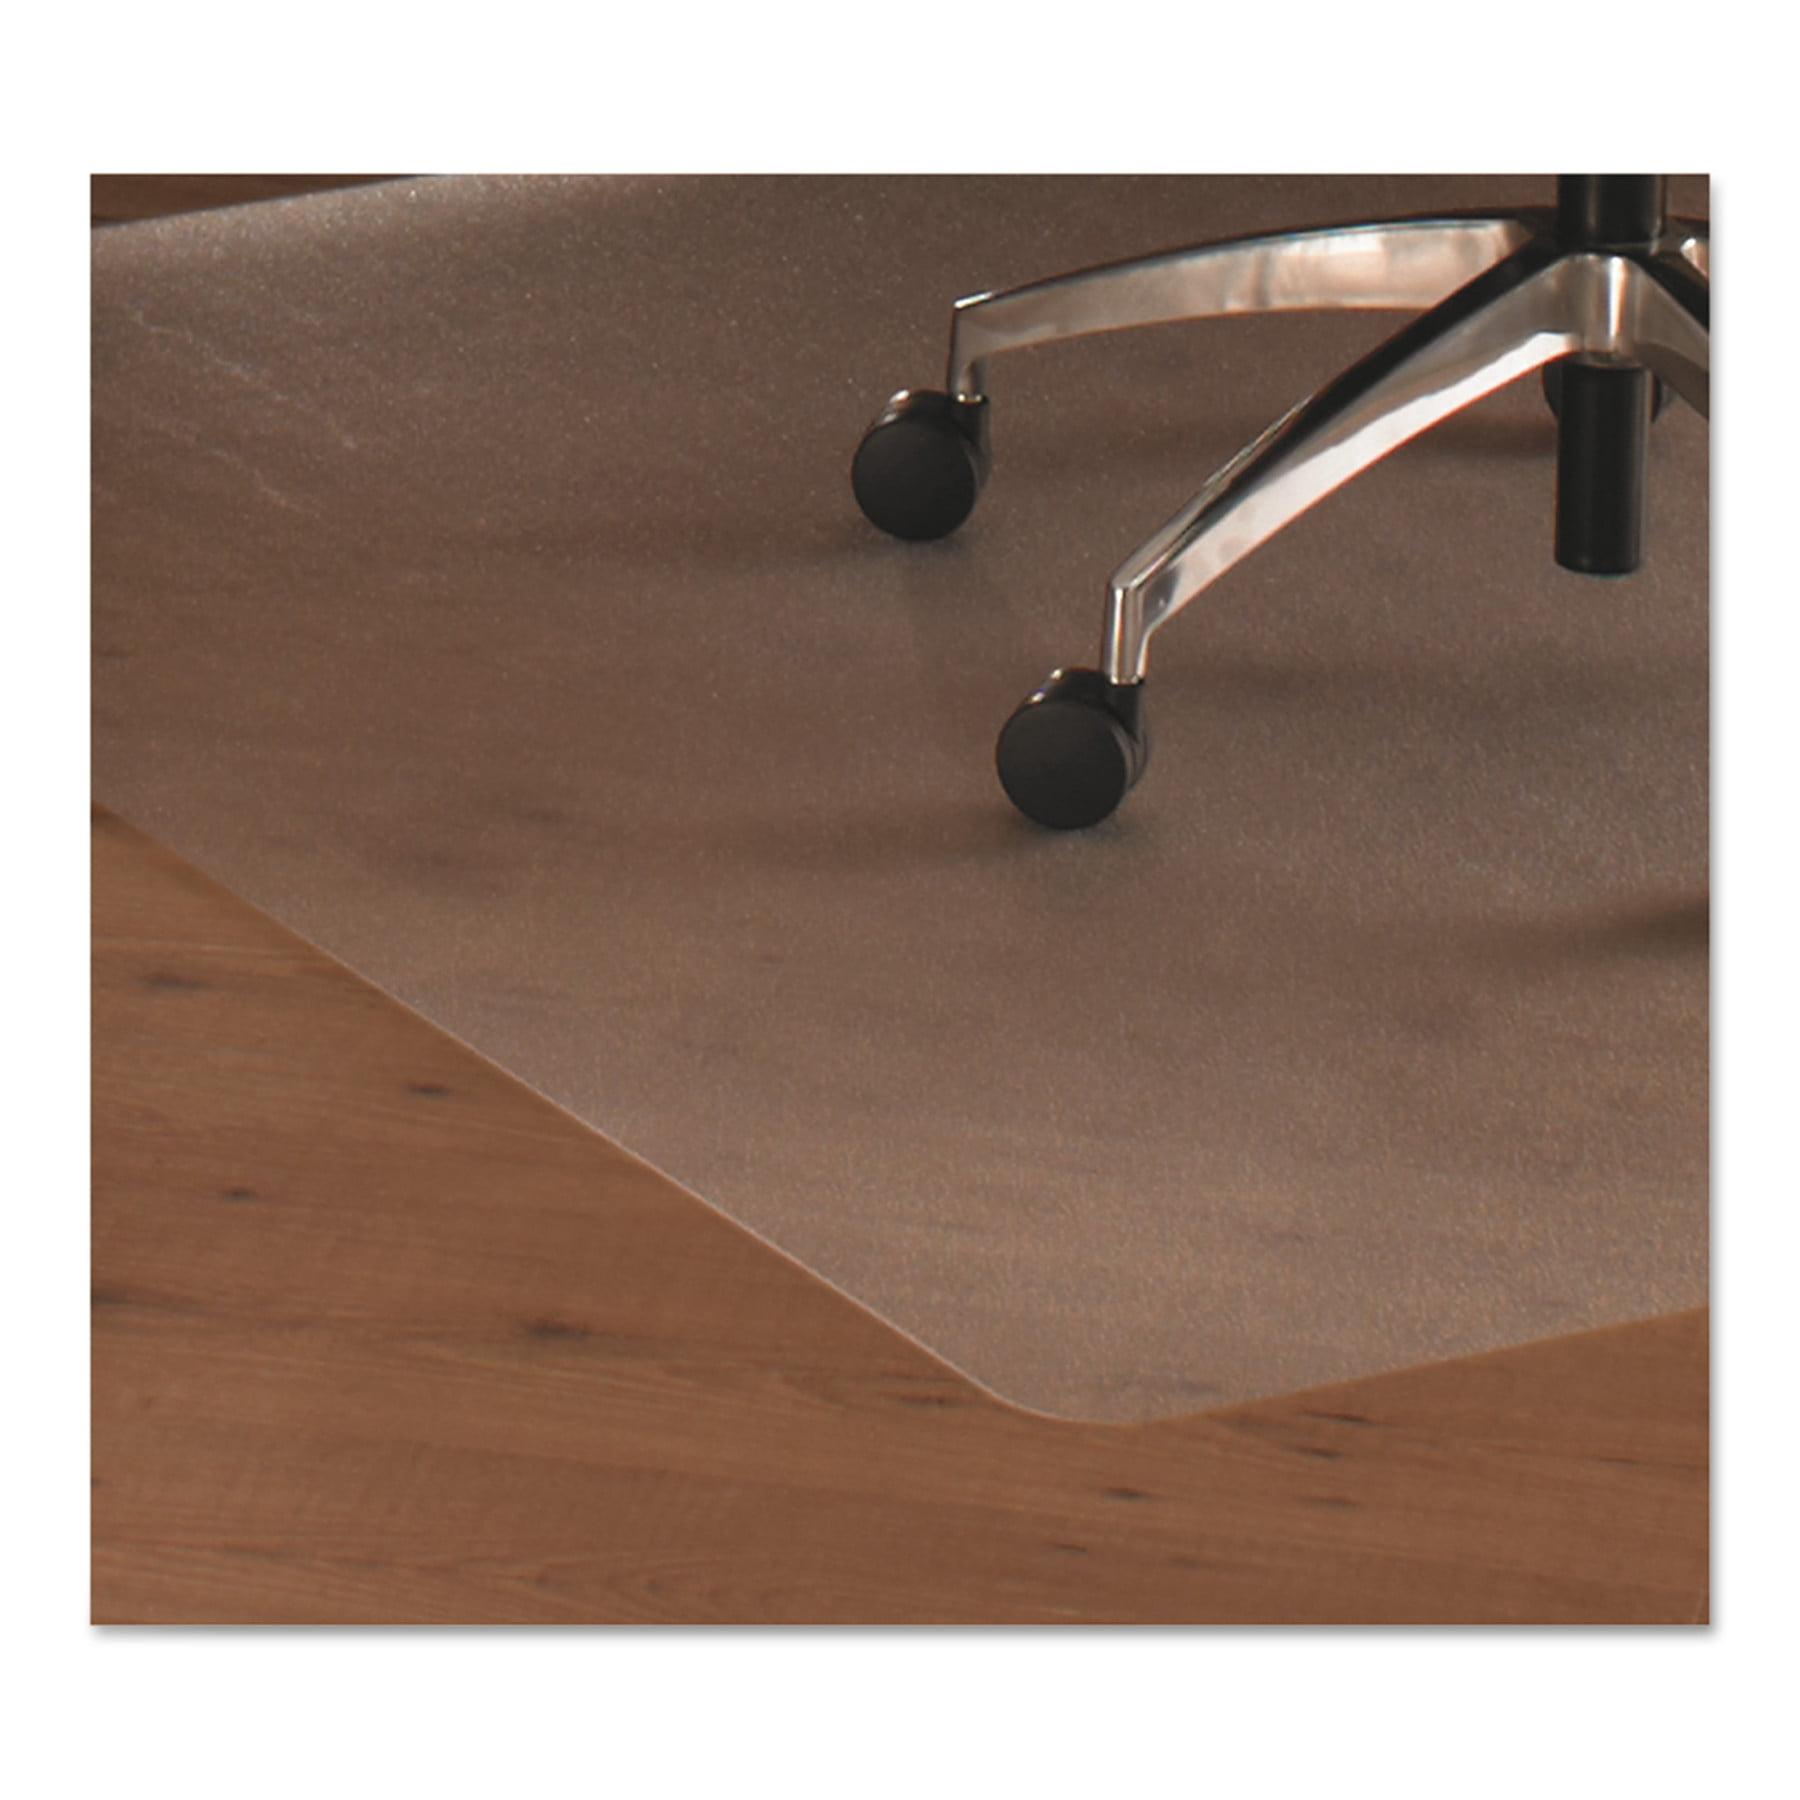 Floortex Cleartex Ultimat Polycarbonate Chair Mat for Hard Floors